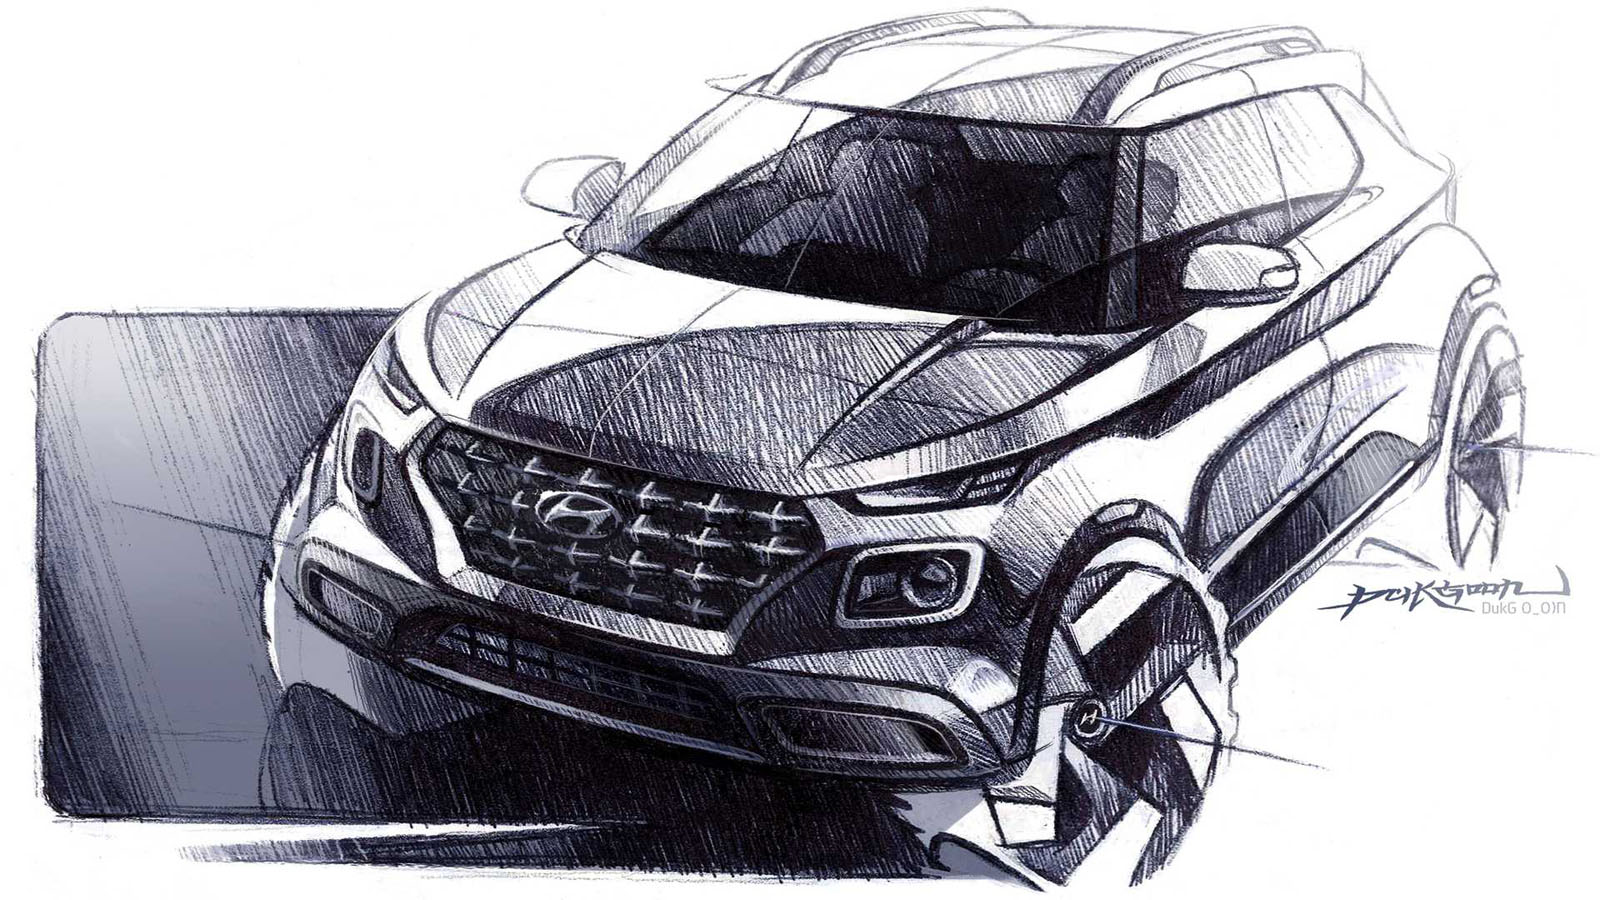 2020 Hyundai Venue Teaser Image